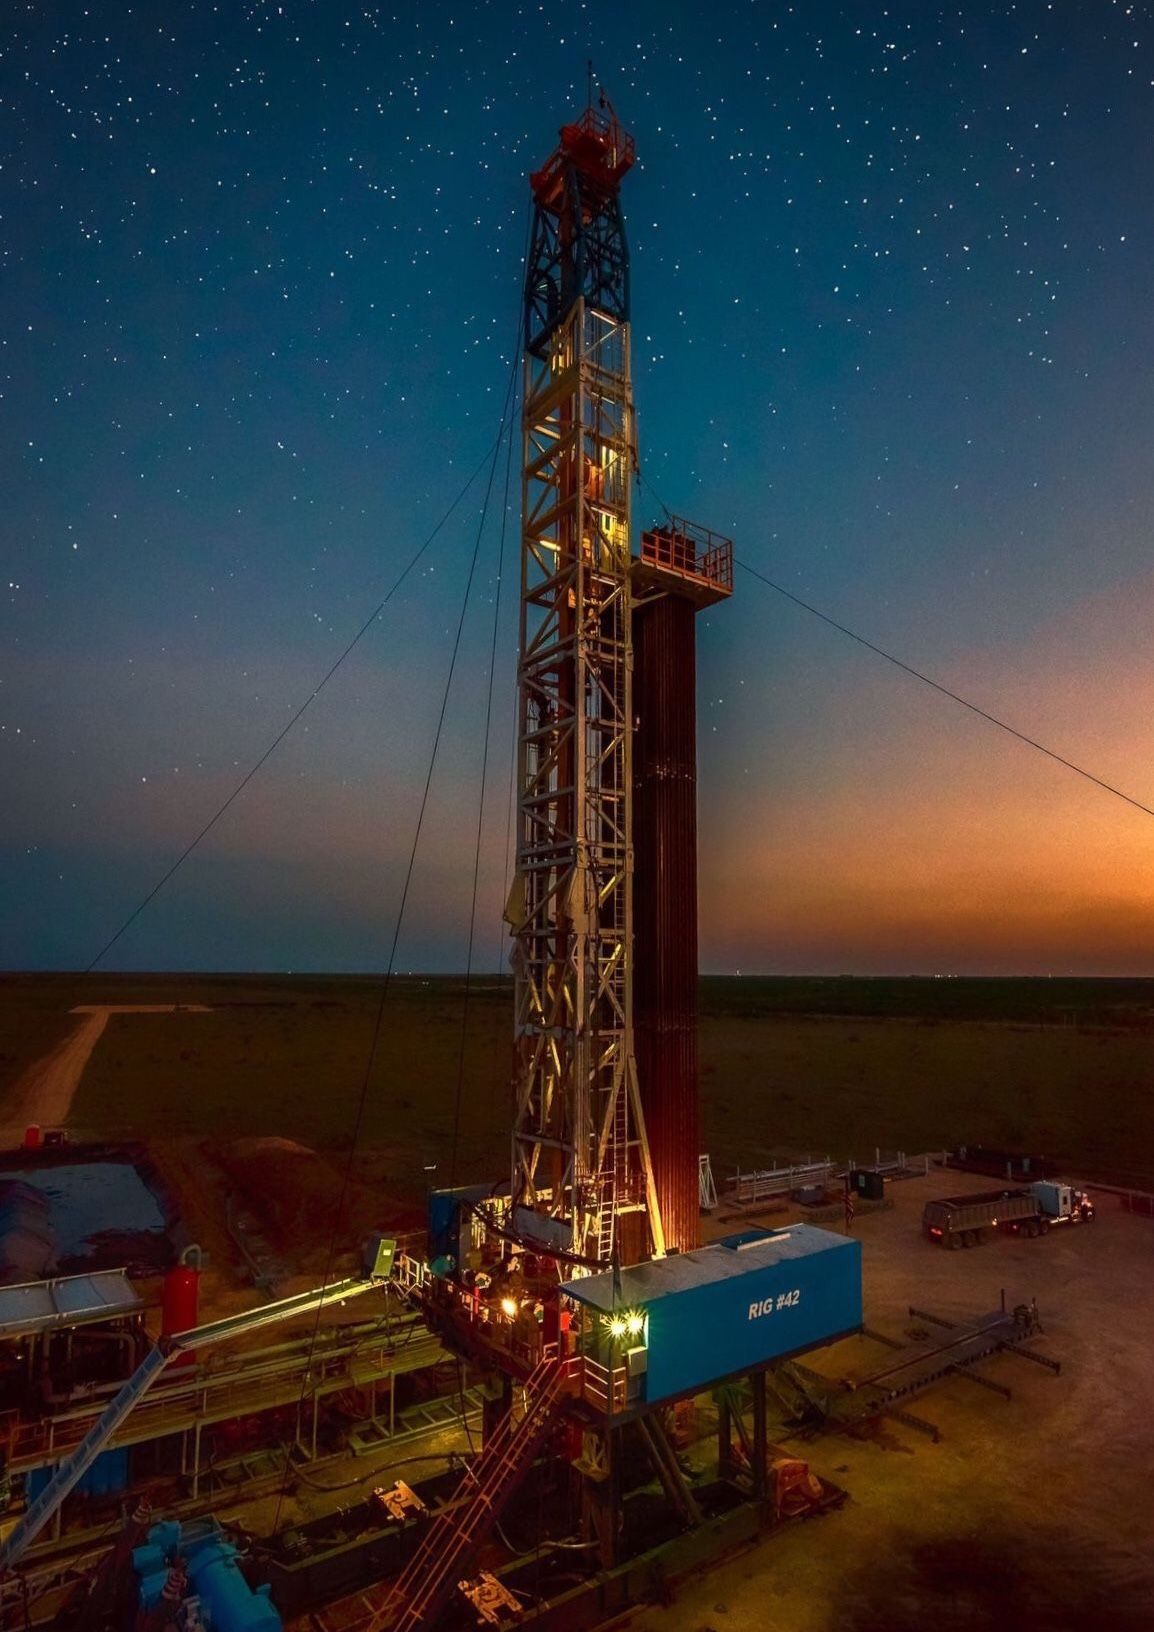 """THE STARS AT NIGHT"" OIL & GAS FINE ART OILFIELD LIFE"